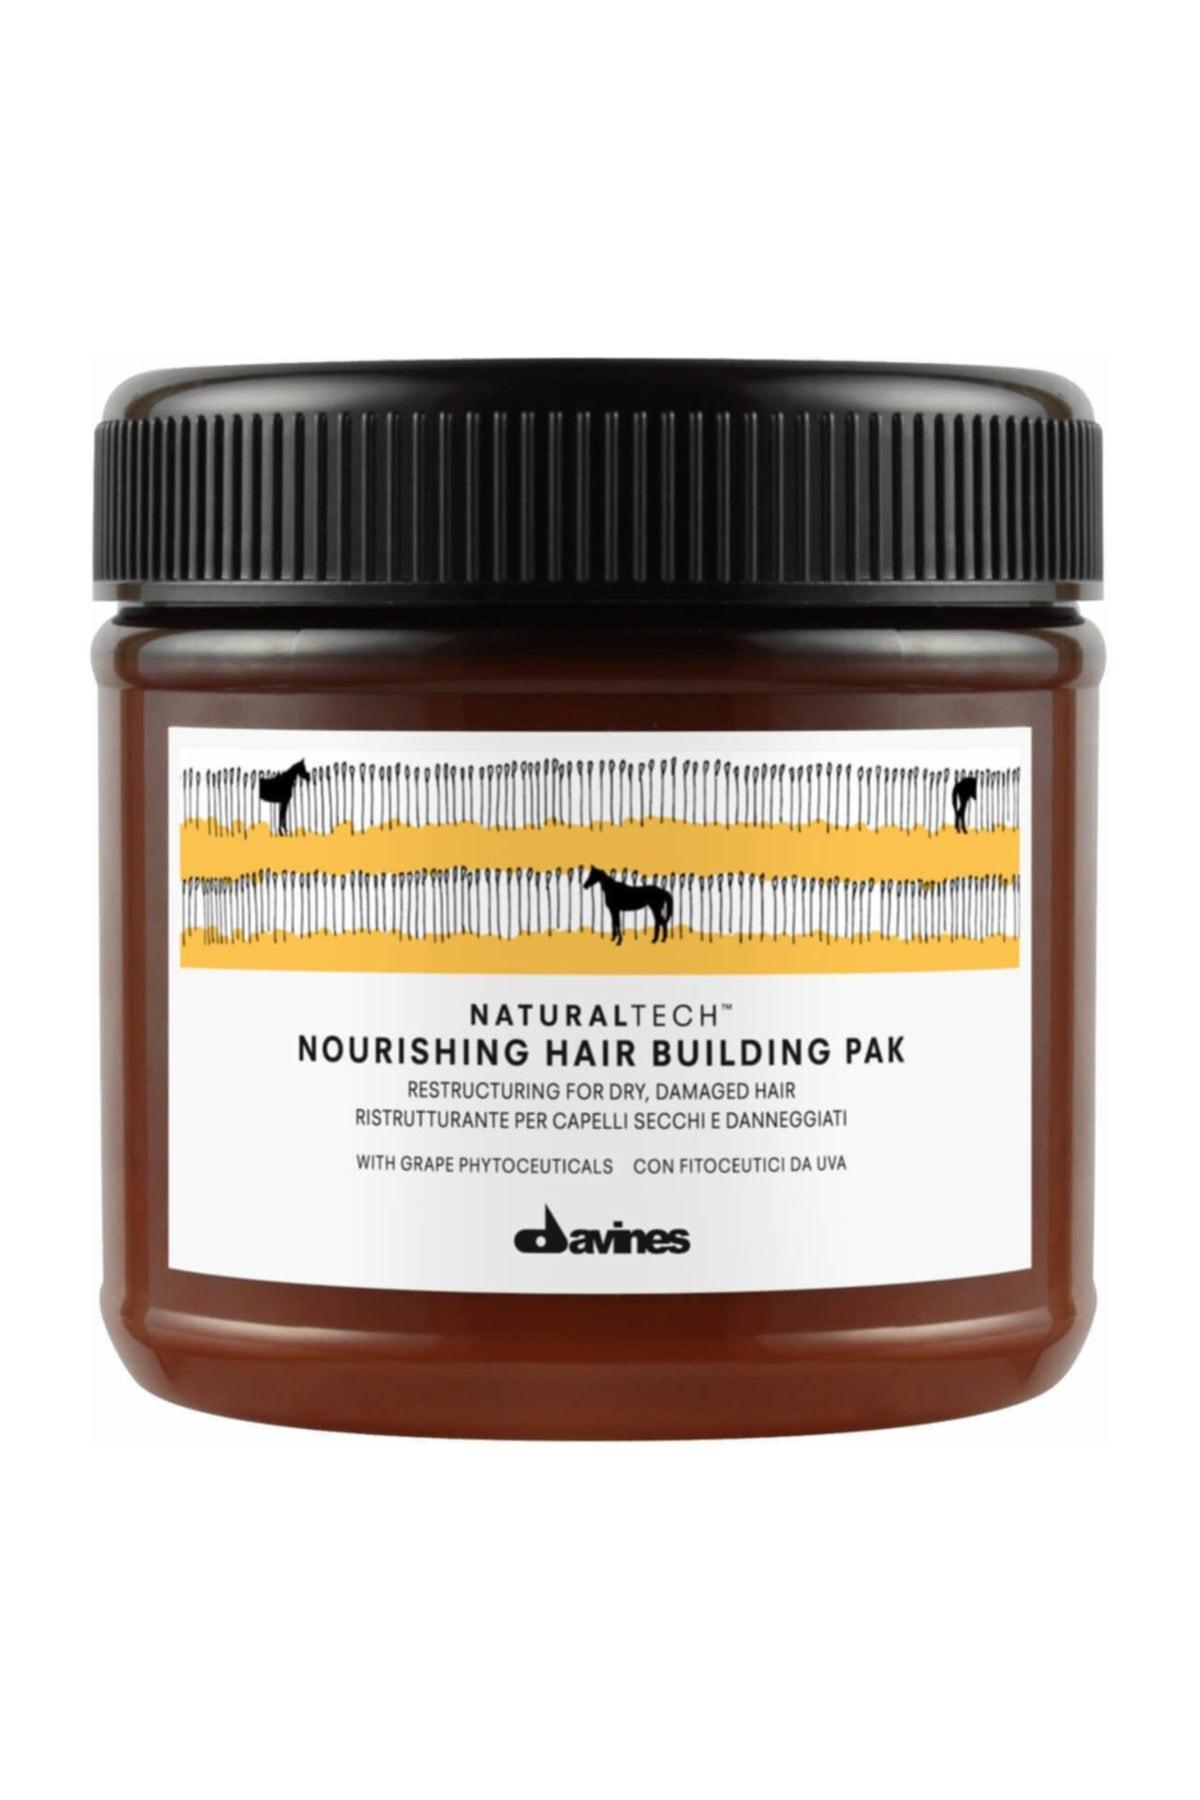 Davines Nourishing Hair Pak Yıpranmış Kuru Saç Maskesi 250 ml 1